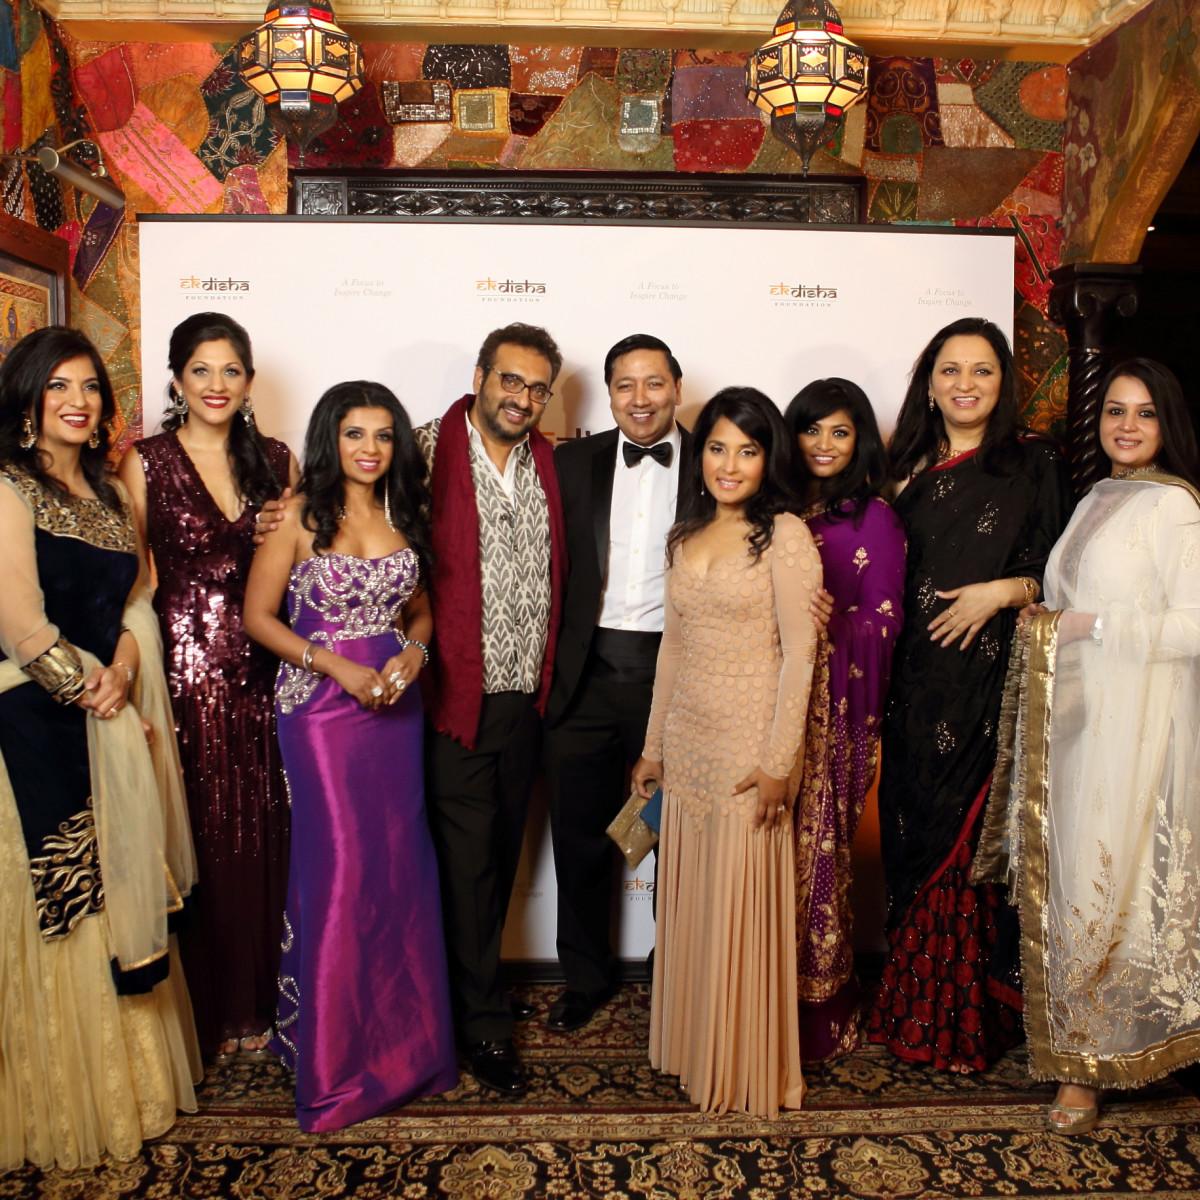 Bass Gala 2015 The Board of Ek Disha: L-R Geeta Anand, Sippi Khurana, Farida Abjani, Gopaal Seyn, Rick Pal, Swati Narayan, Raj Patel, Jyoti Malhan, Irum Javed